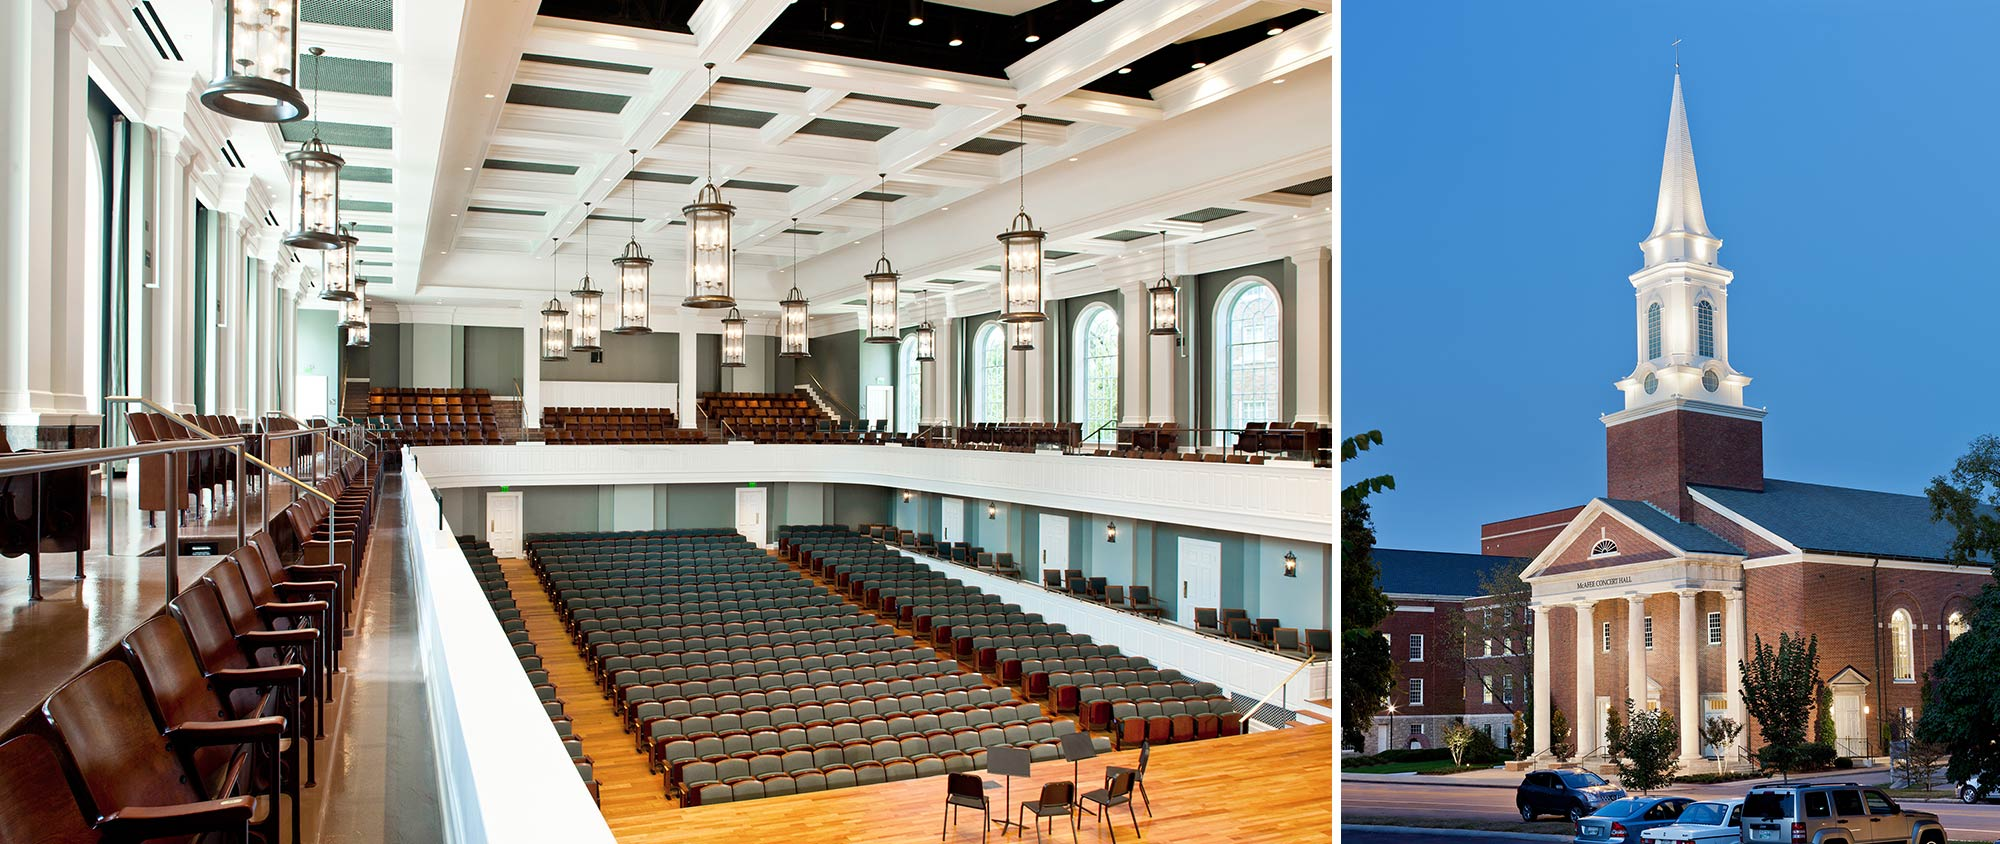 Belmont University McAfee Concert Hall